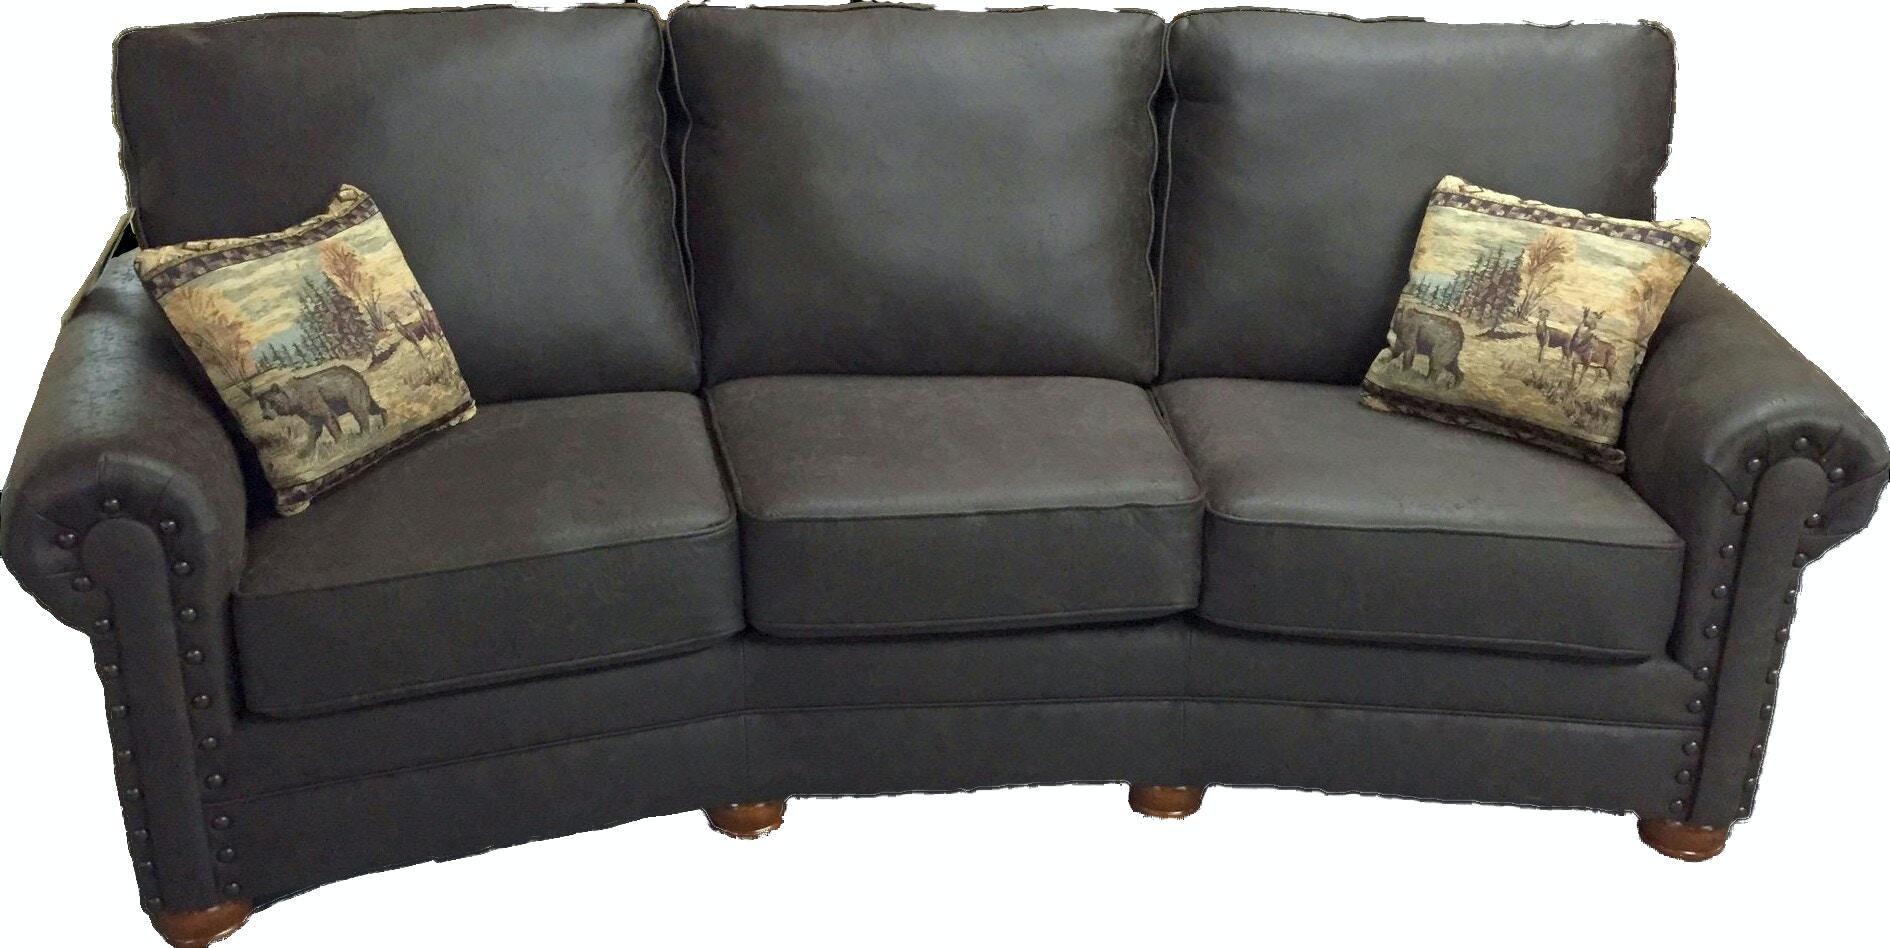 Best Craft Conversational Sofa In Colt Brown 8039 Colt Brown